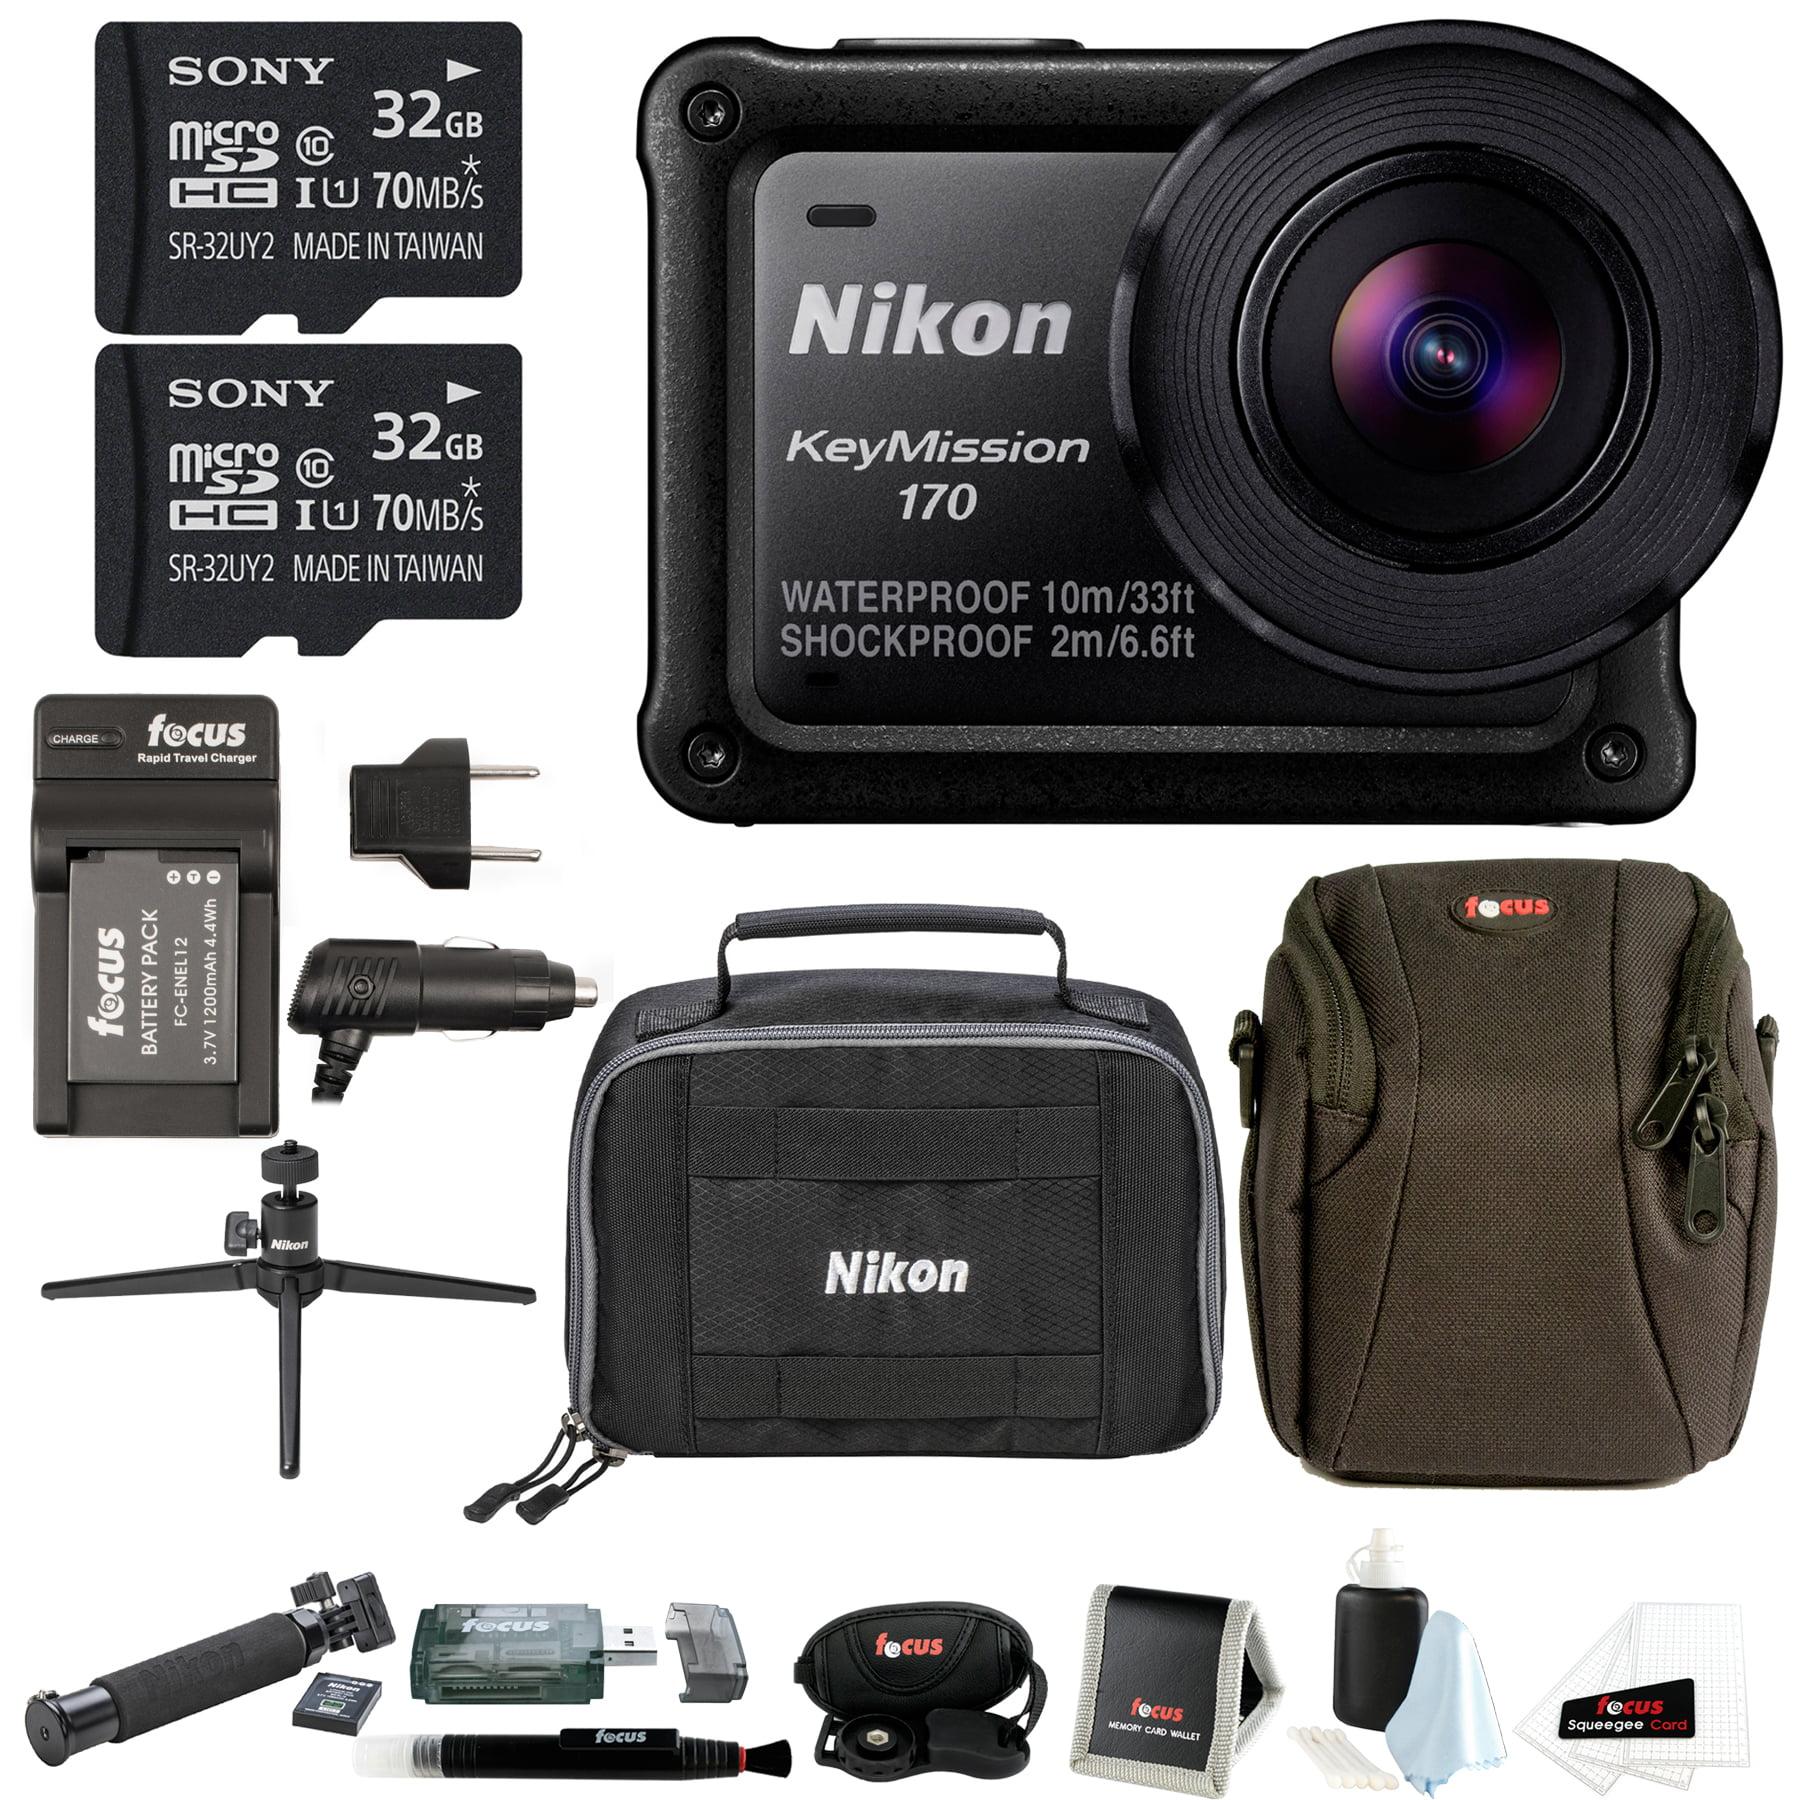 Nikon KeyMission 170 w/ Nikon Accessory Pack & 64GB SD Card Bundle